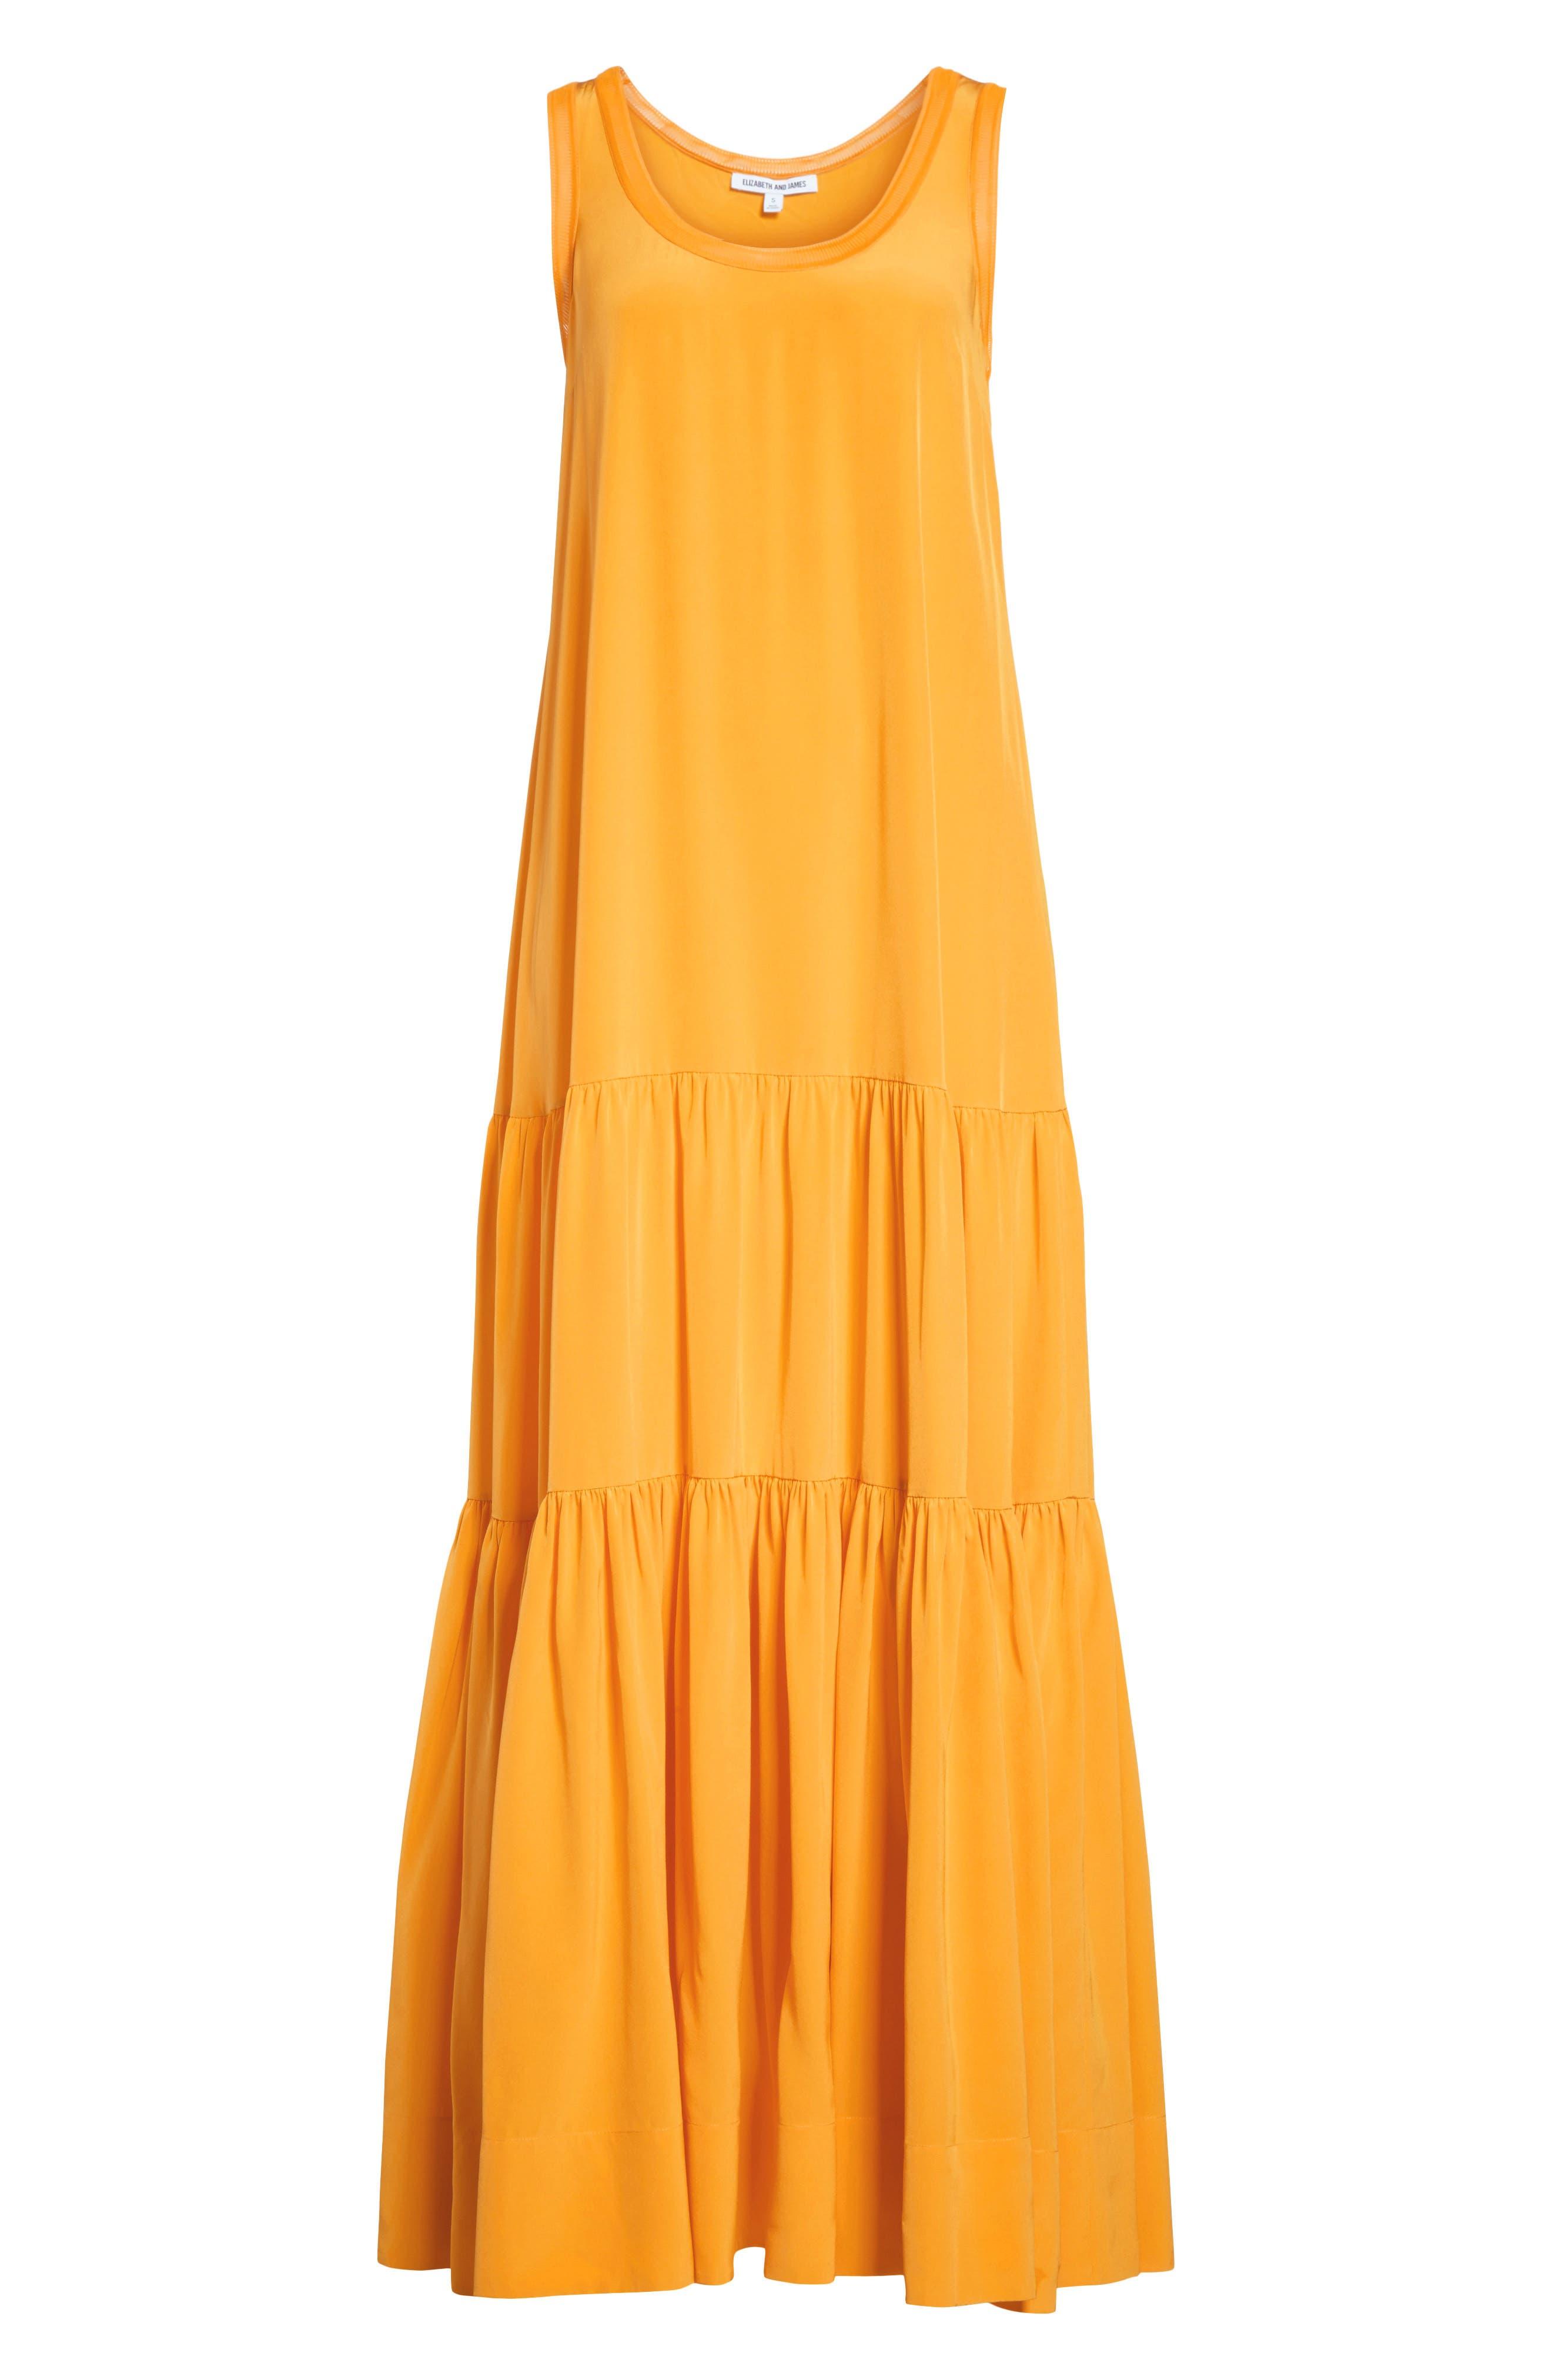 Hazel Silk Tank Dress,                             Alternate thumbnail 8, color,                             Saffron